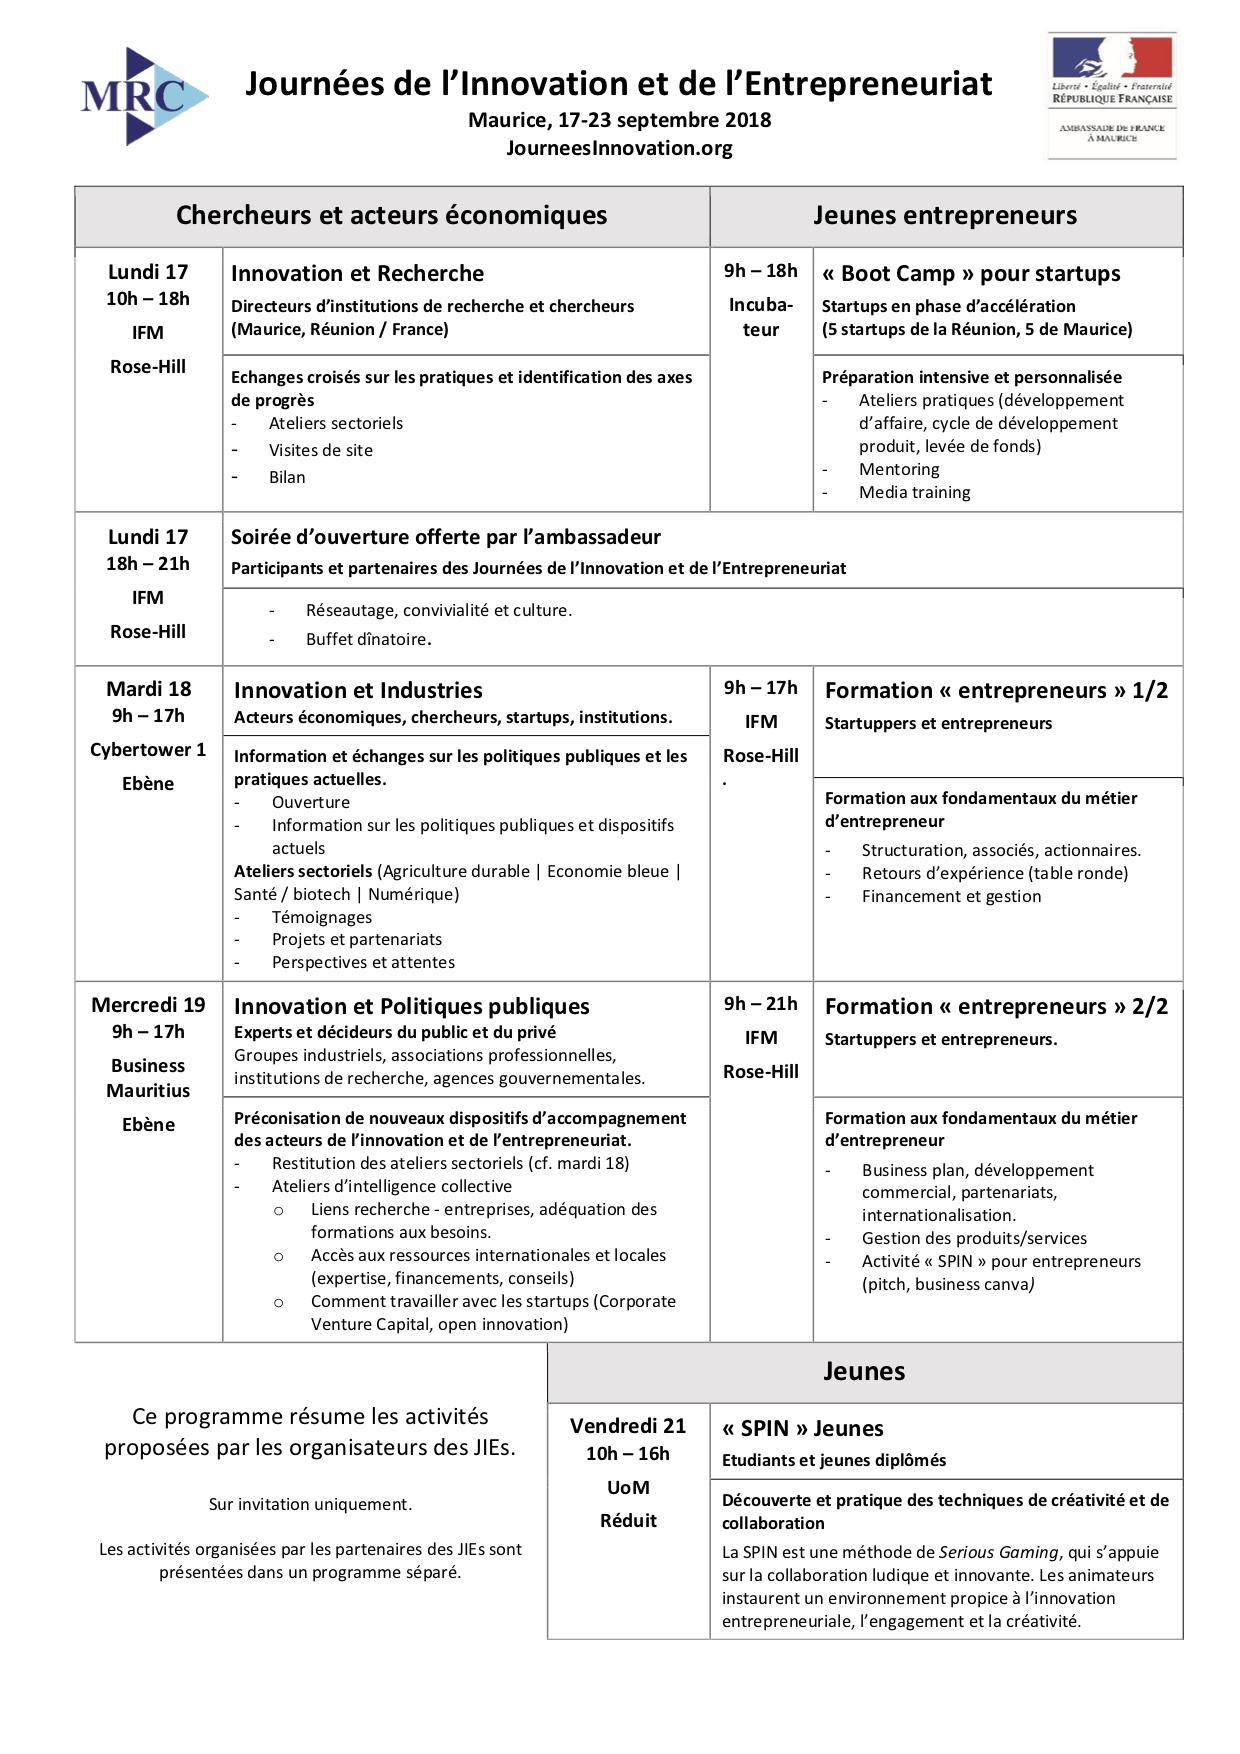 JIE - Programme general - copie